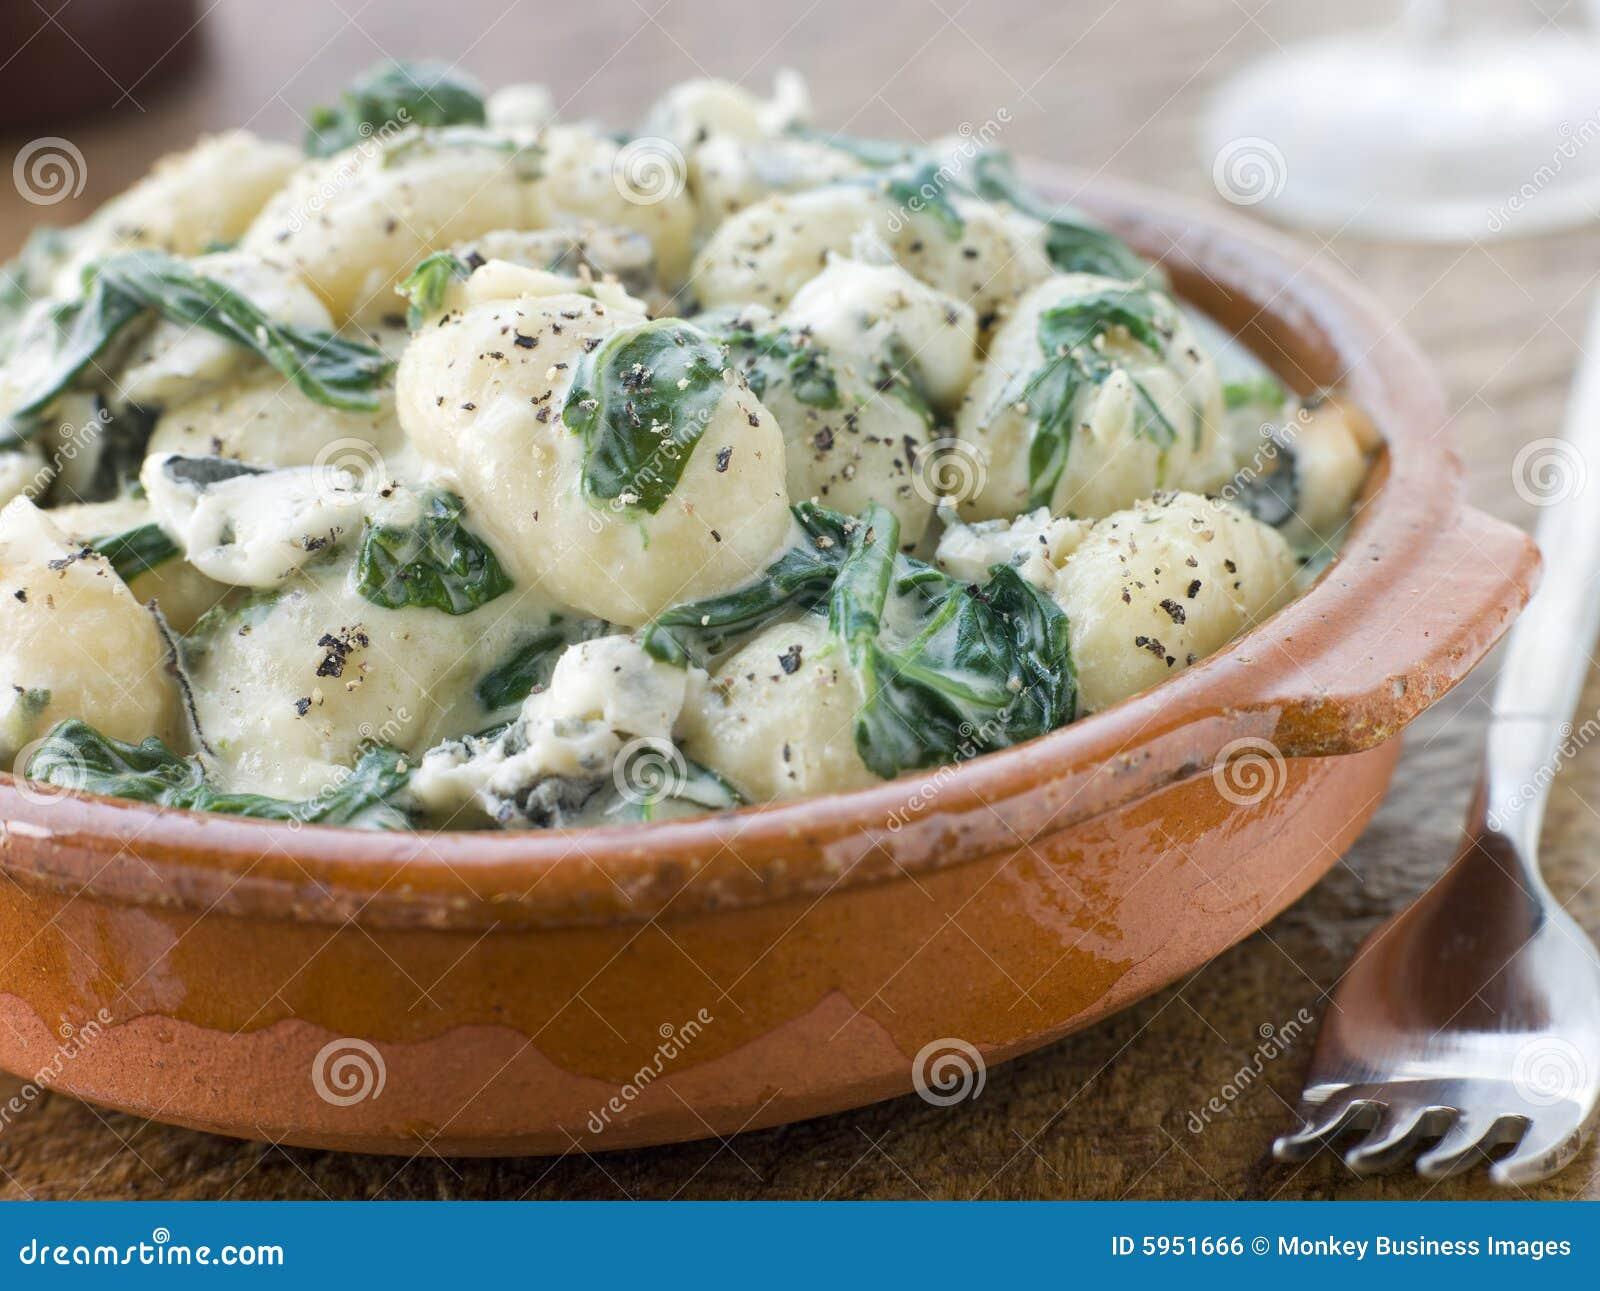 Gnocchi and Spinach with a Gorgonzola Cream Sauce